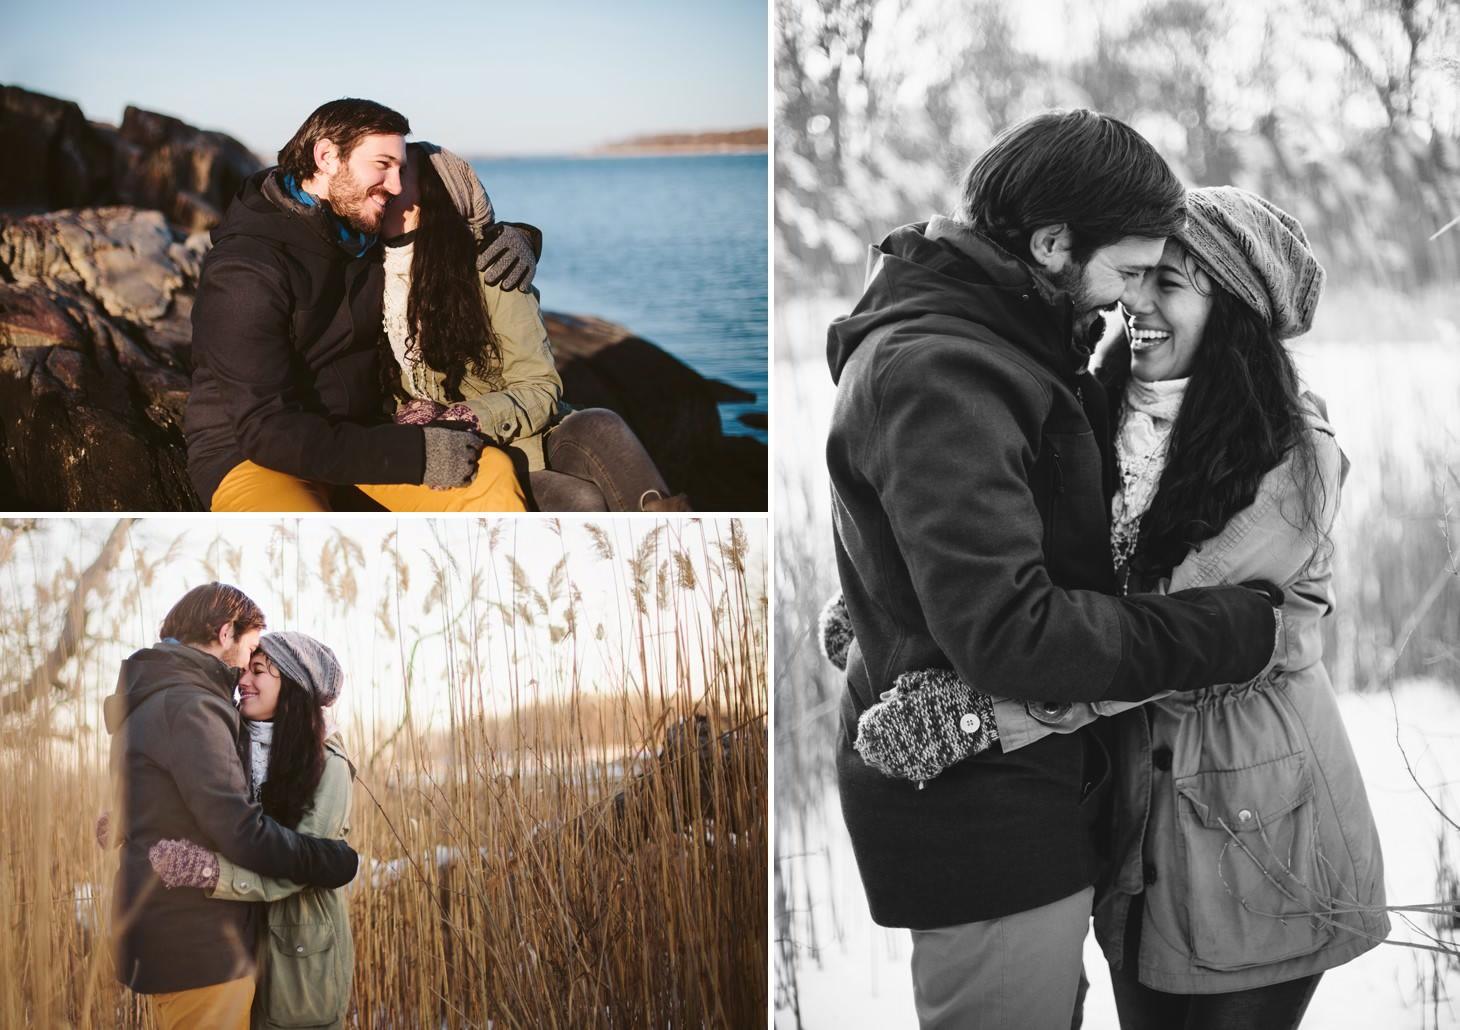 033-nyc-wedding-photographer-orchard-beach-bronx-engagement-winter-smitten-chickens.jpg